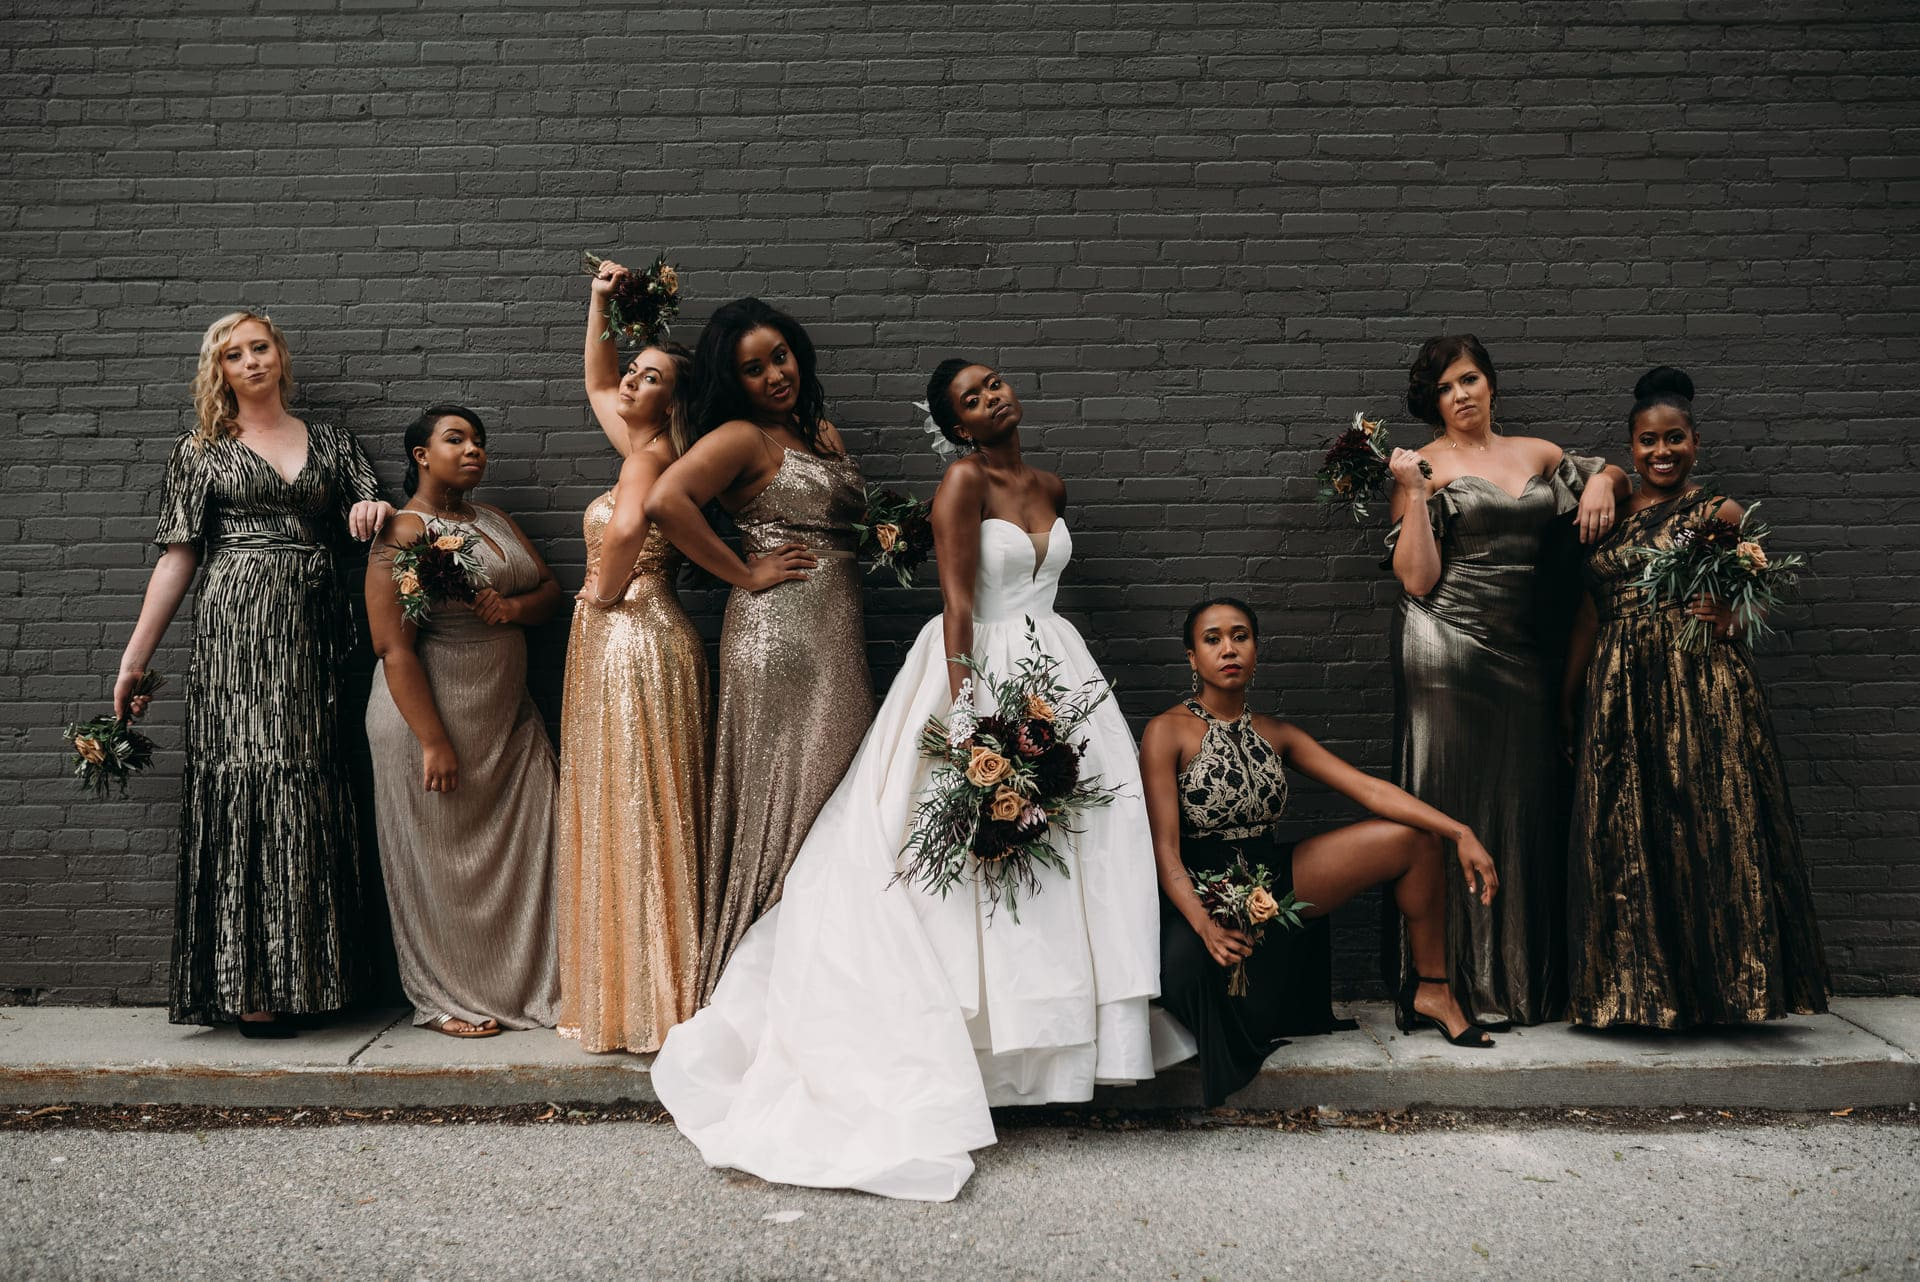 Bride Friends Richland Michigan Wedding Photography